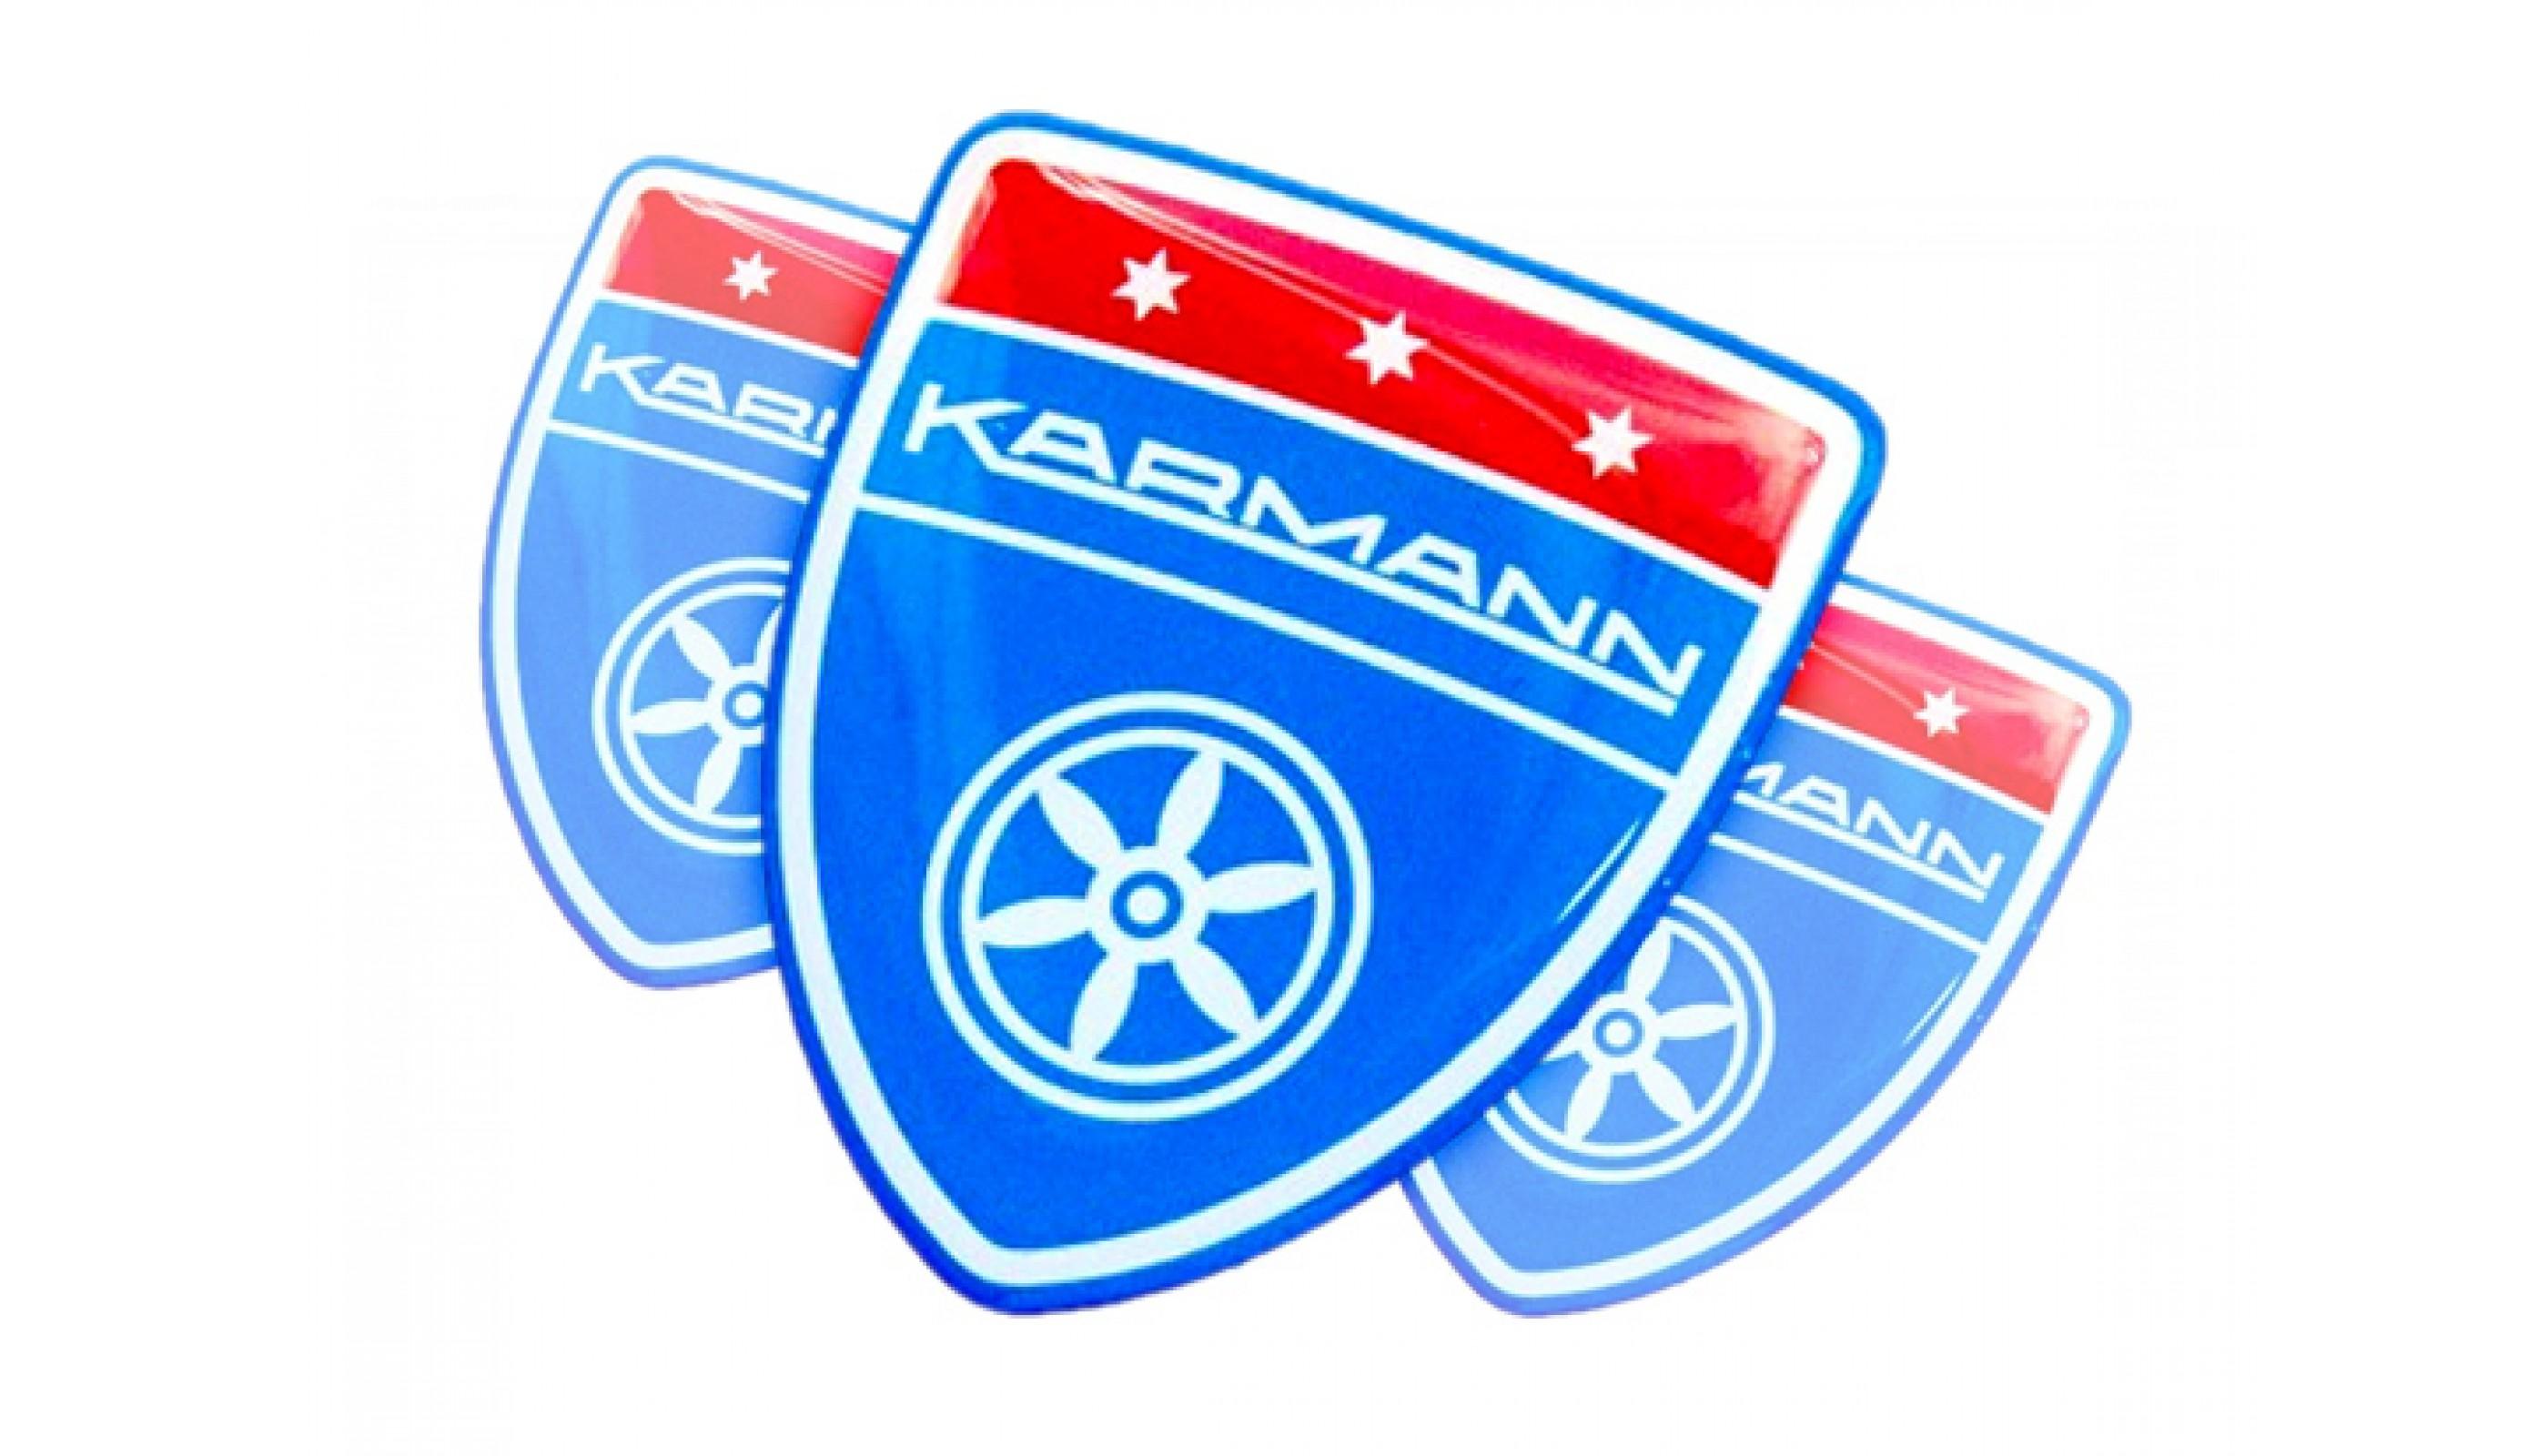 Karmann Blue Domed Emblems 3pcs